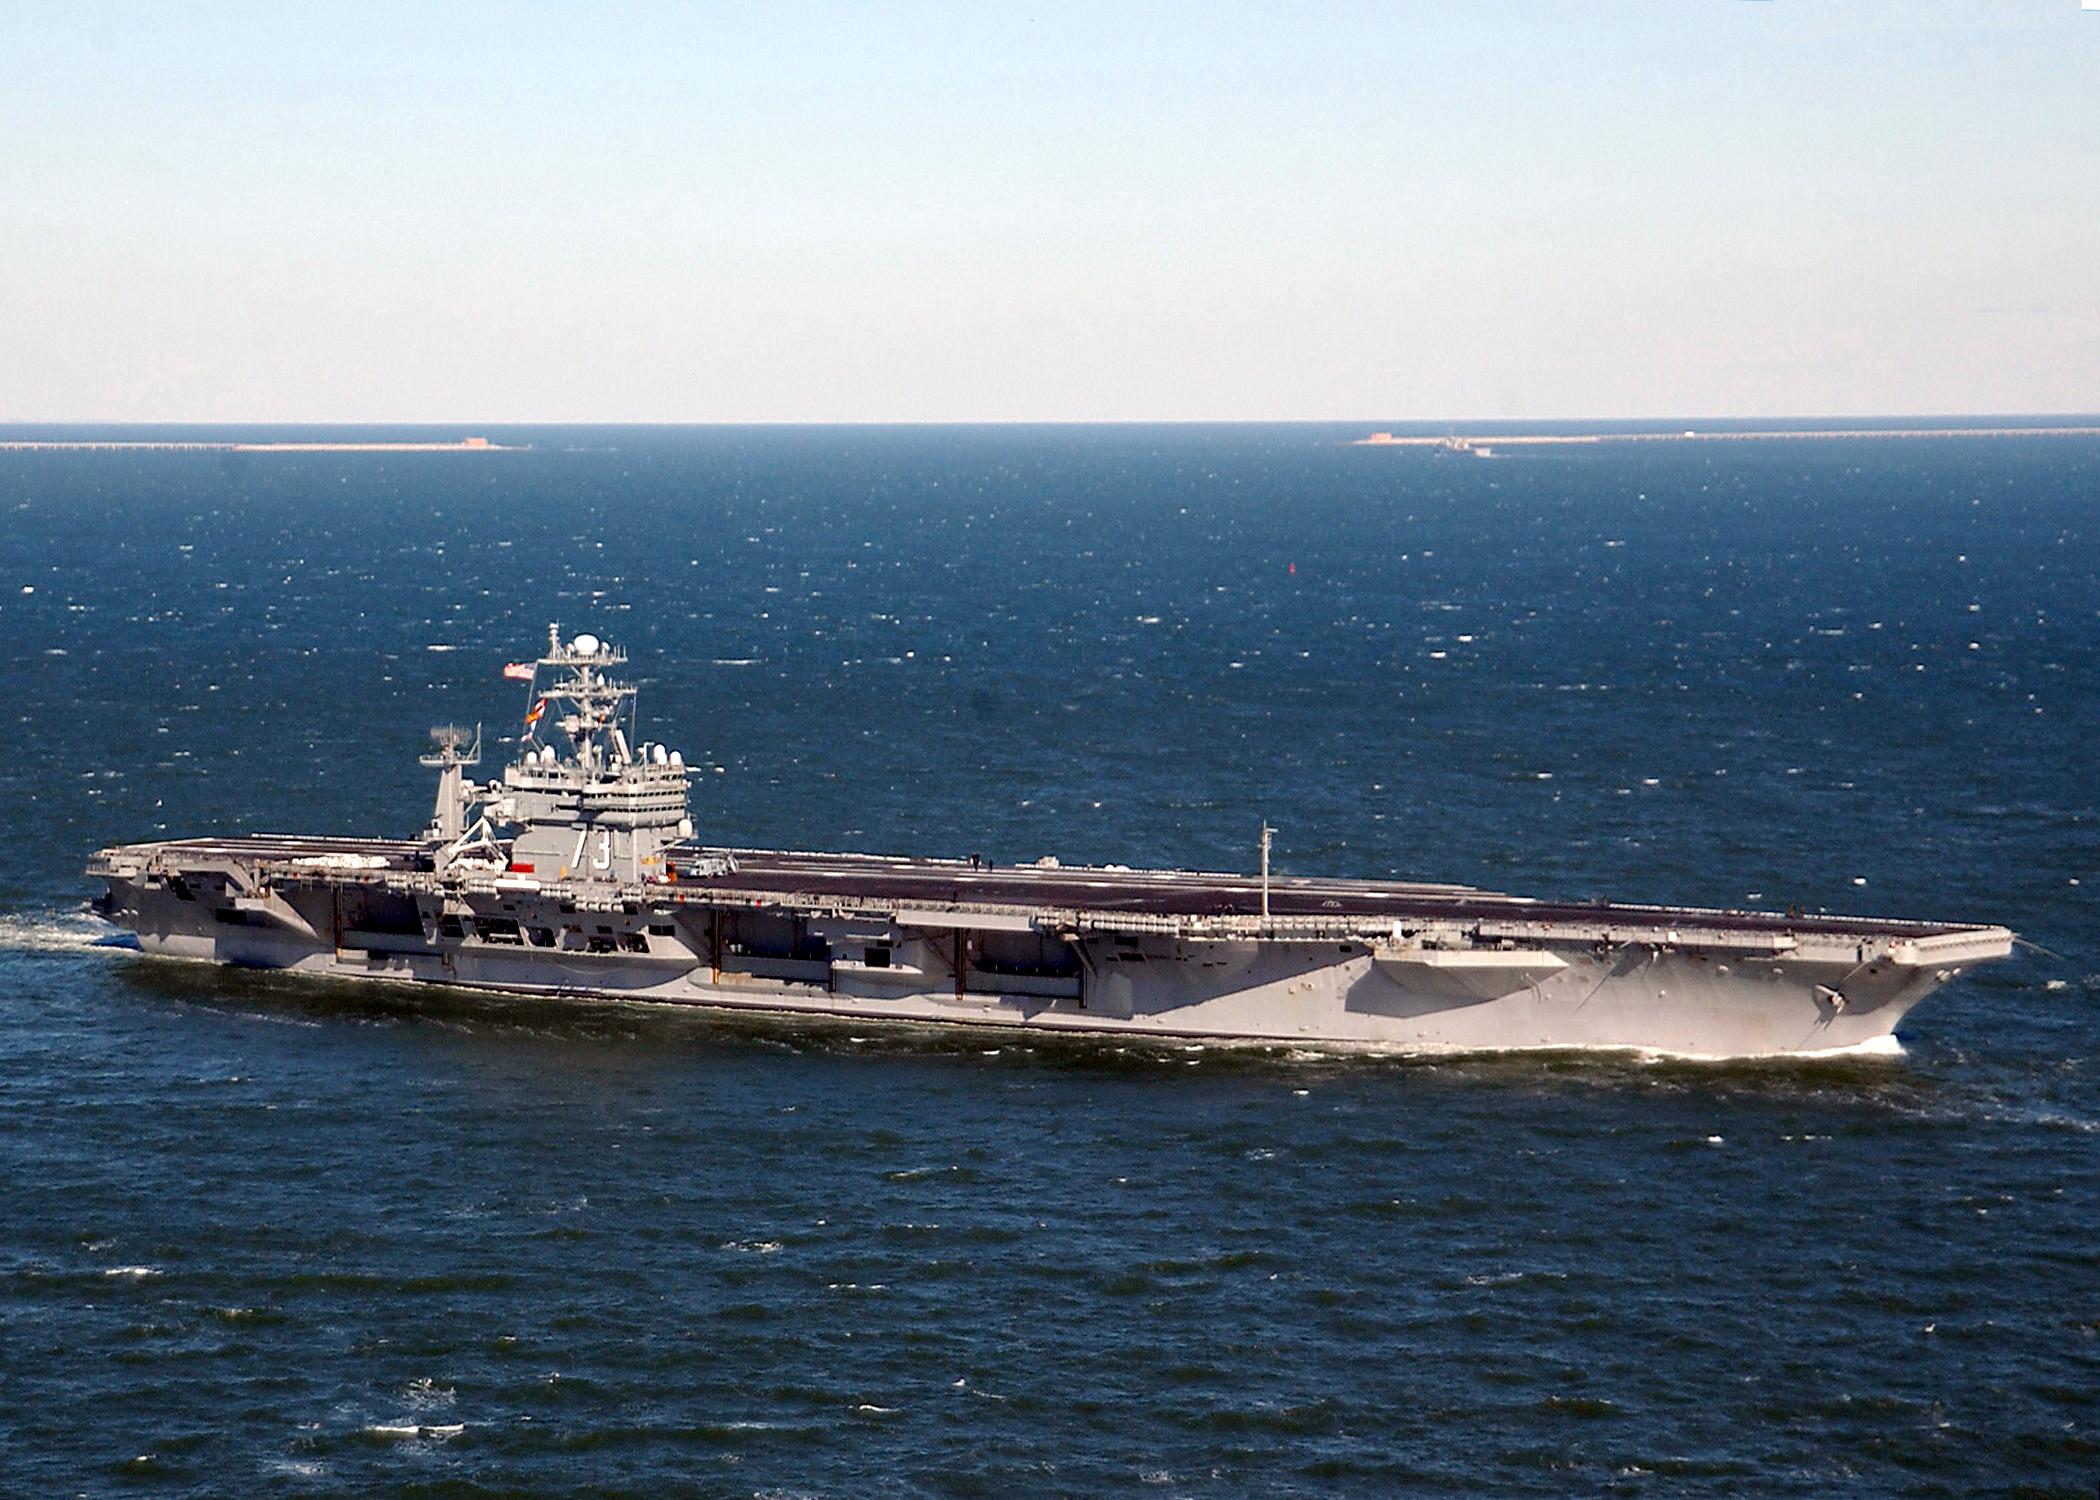 Uss George Washington (cvn 73) Sails Past The Chesapeake Bay.